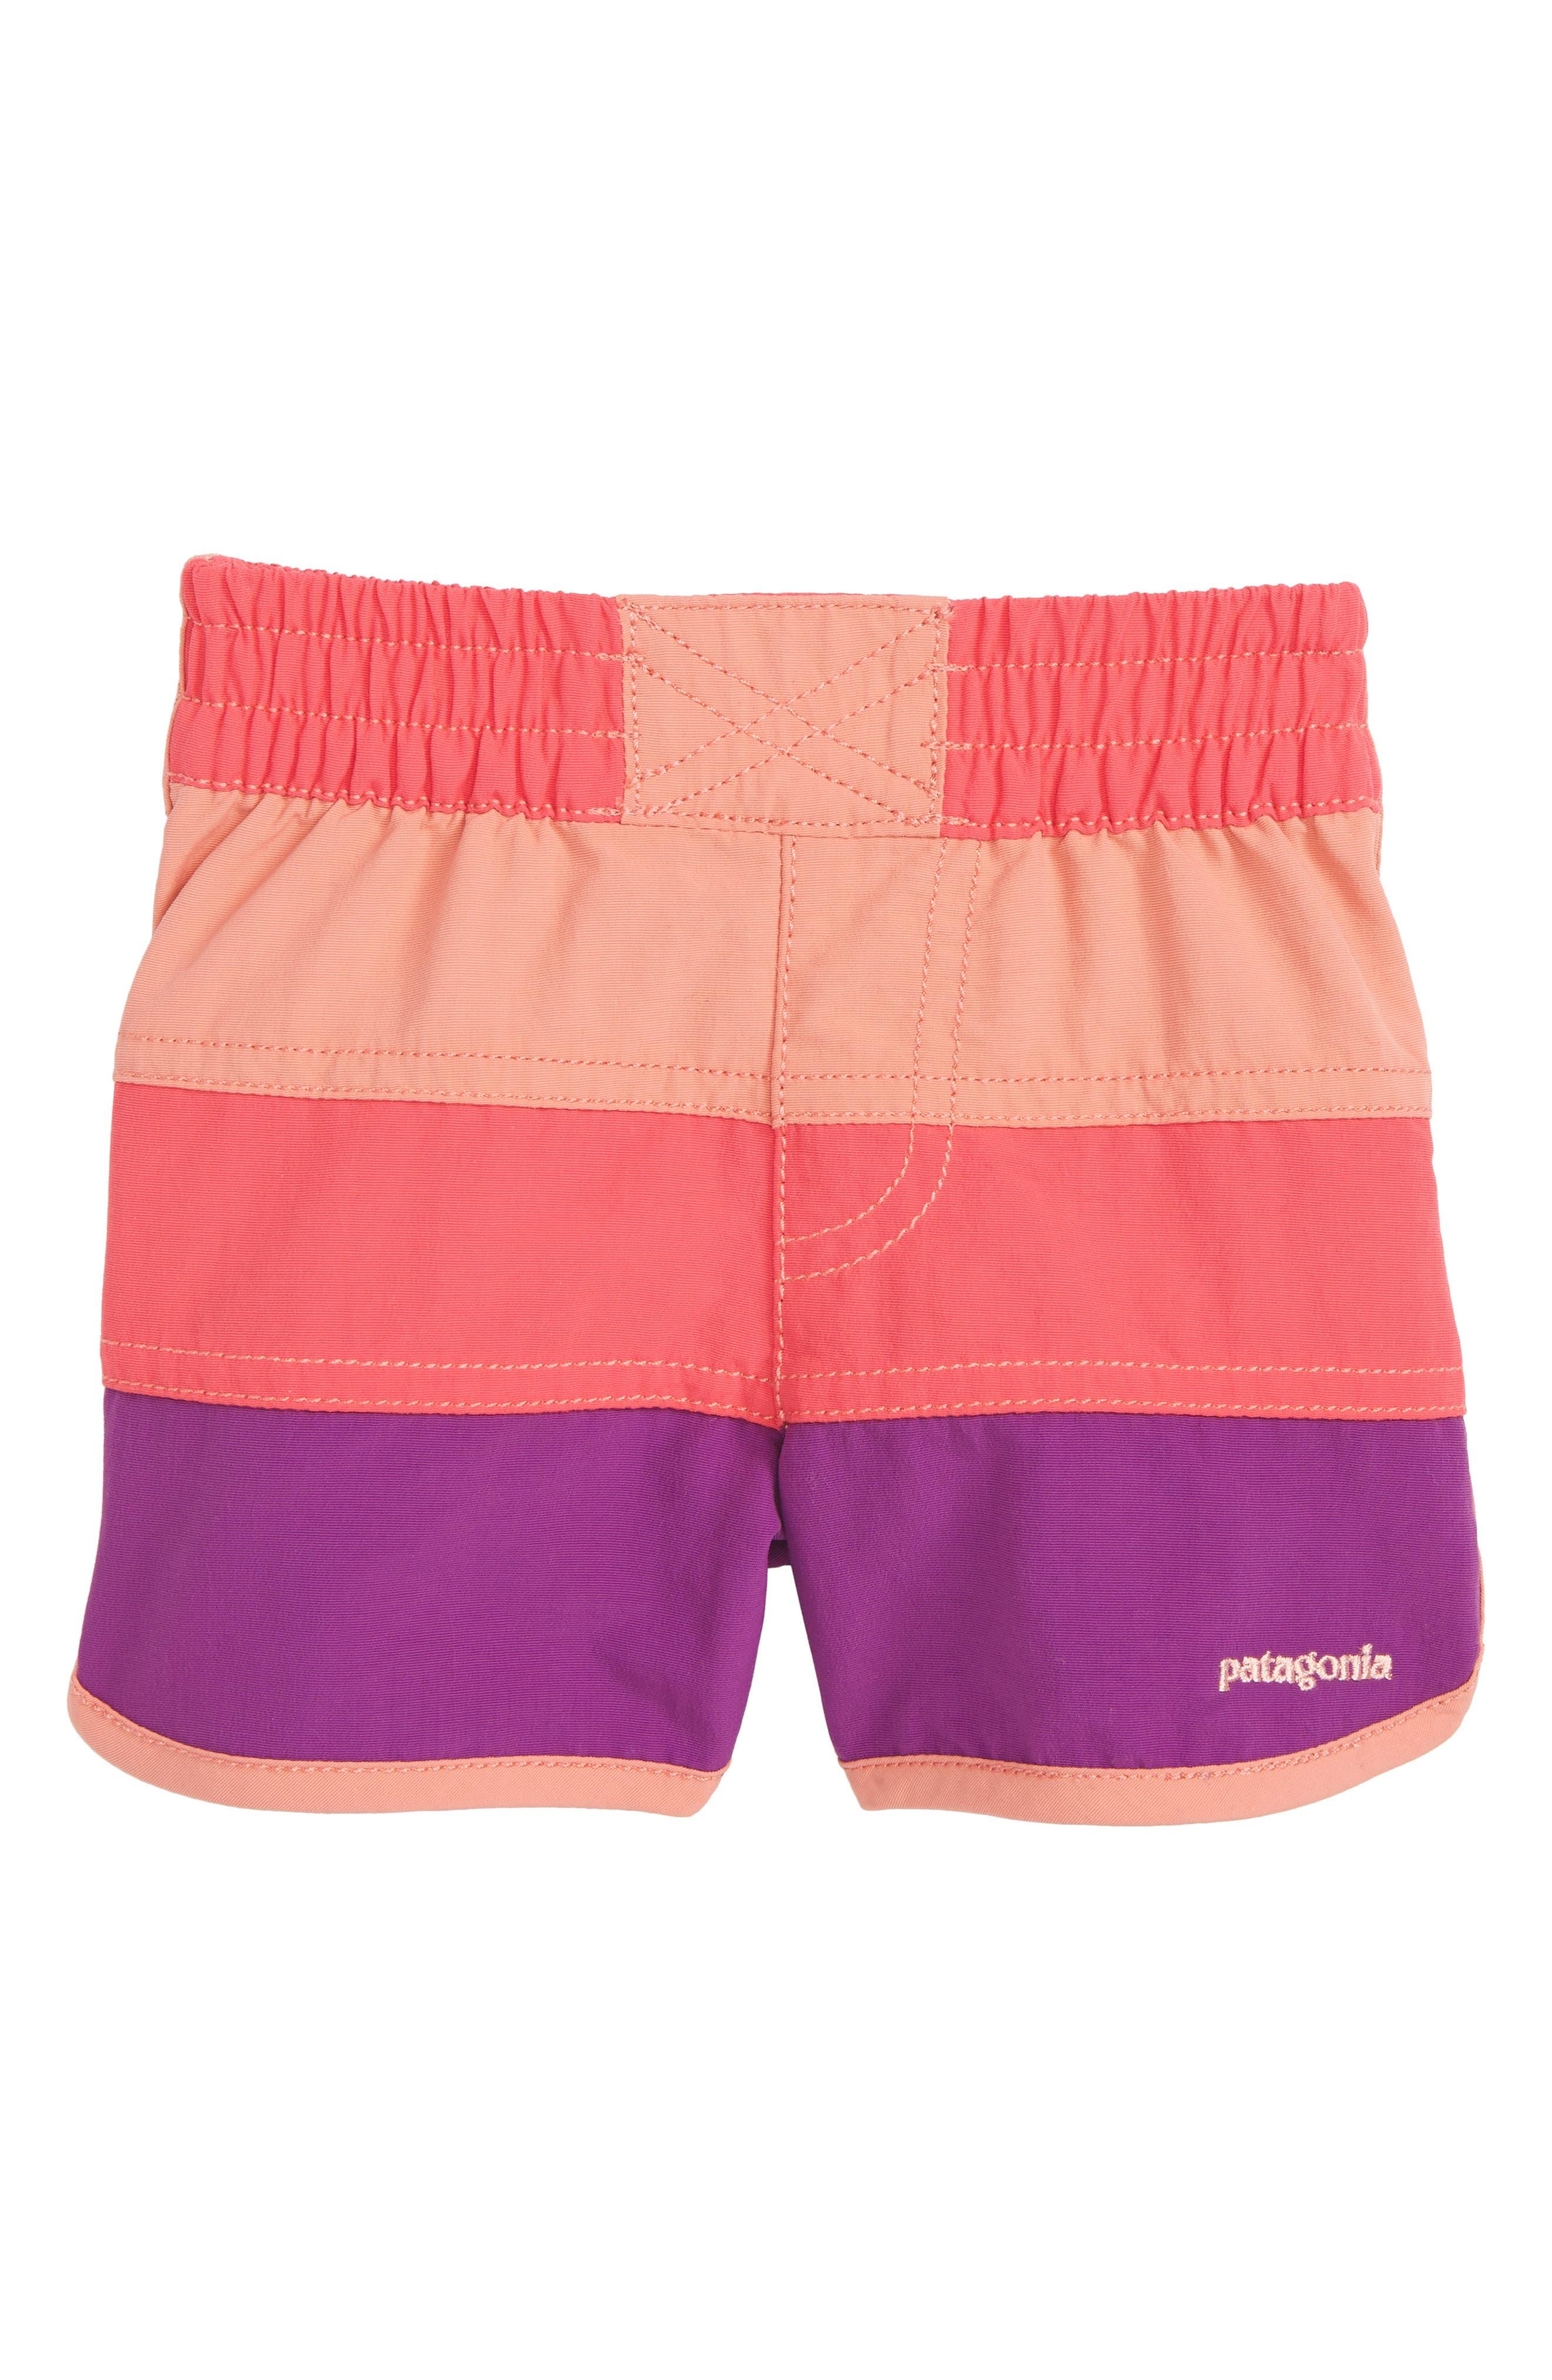 Board Shorts,                         Main,                         color, Srap Sierra Pink